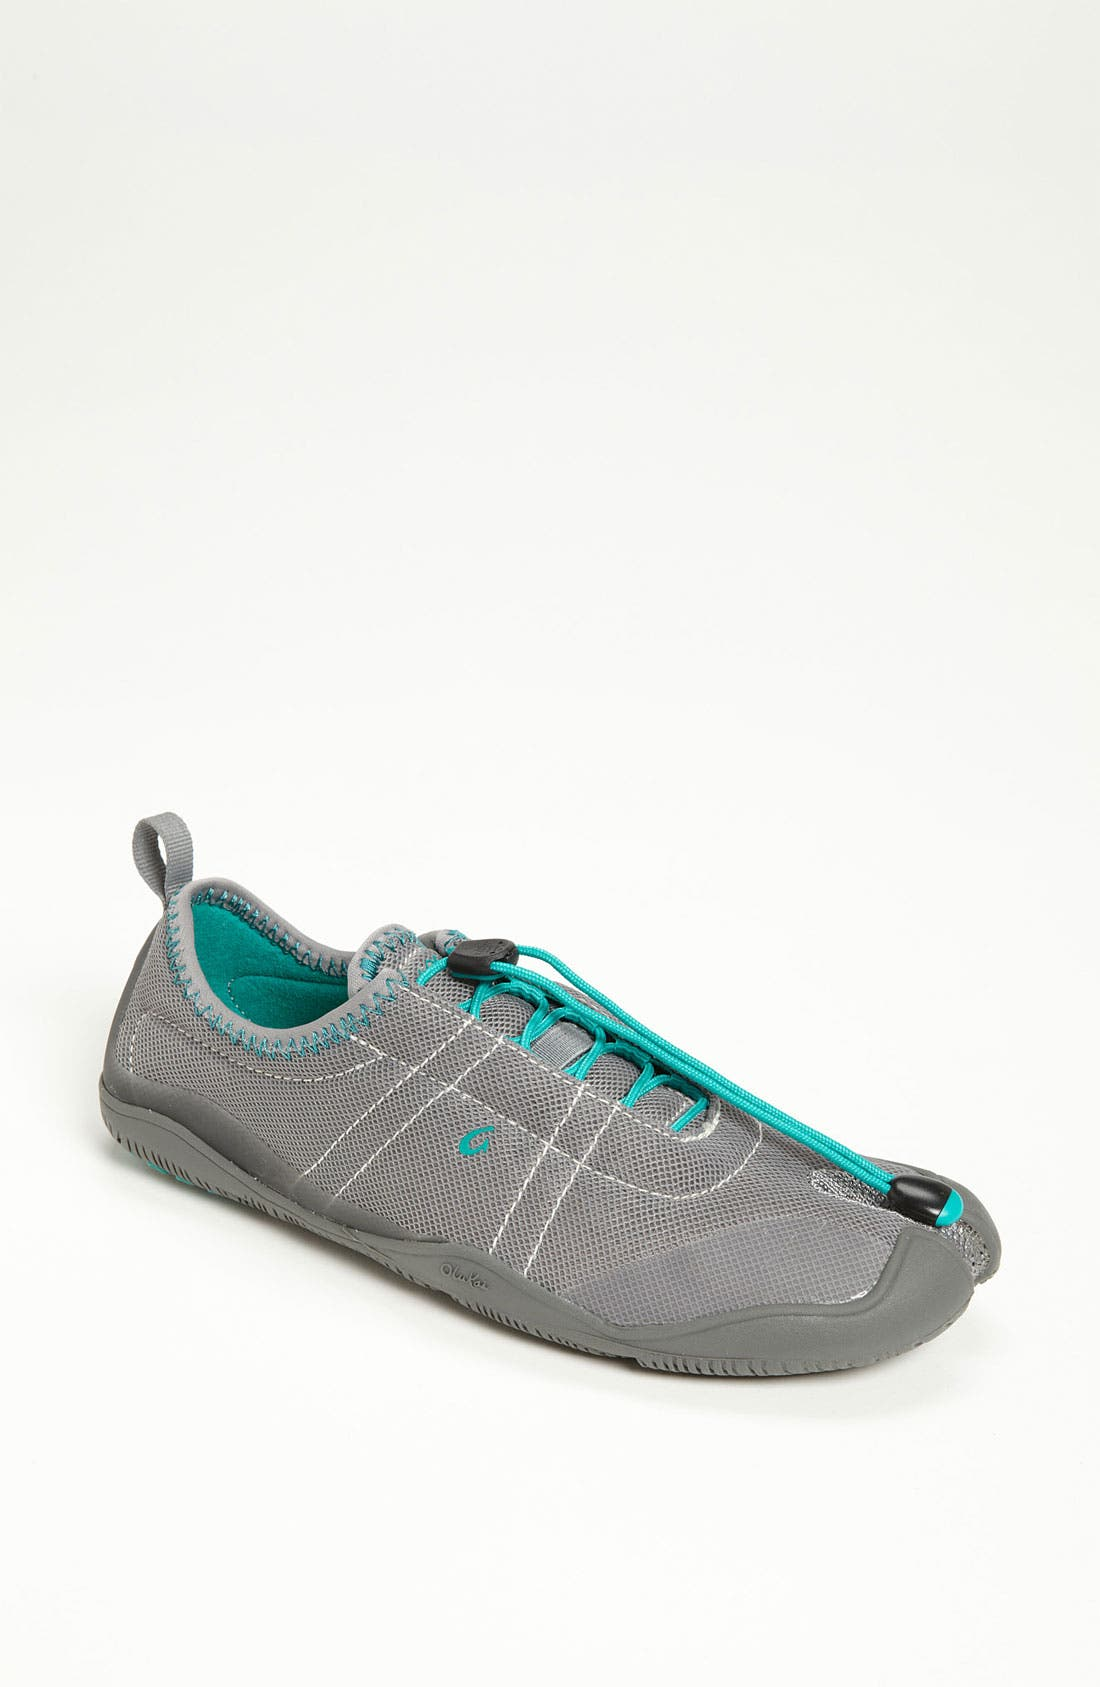 Alternate Image 1 Selected - OluKai 'Maliko' Sneaker (Women)